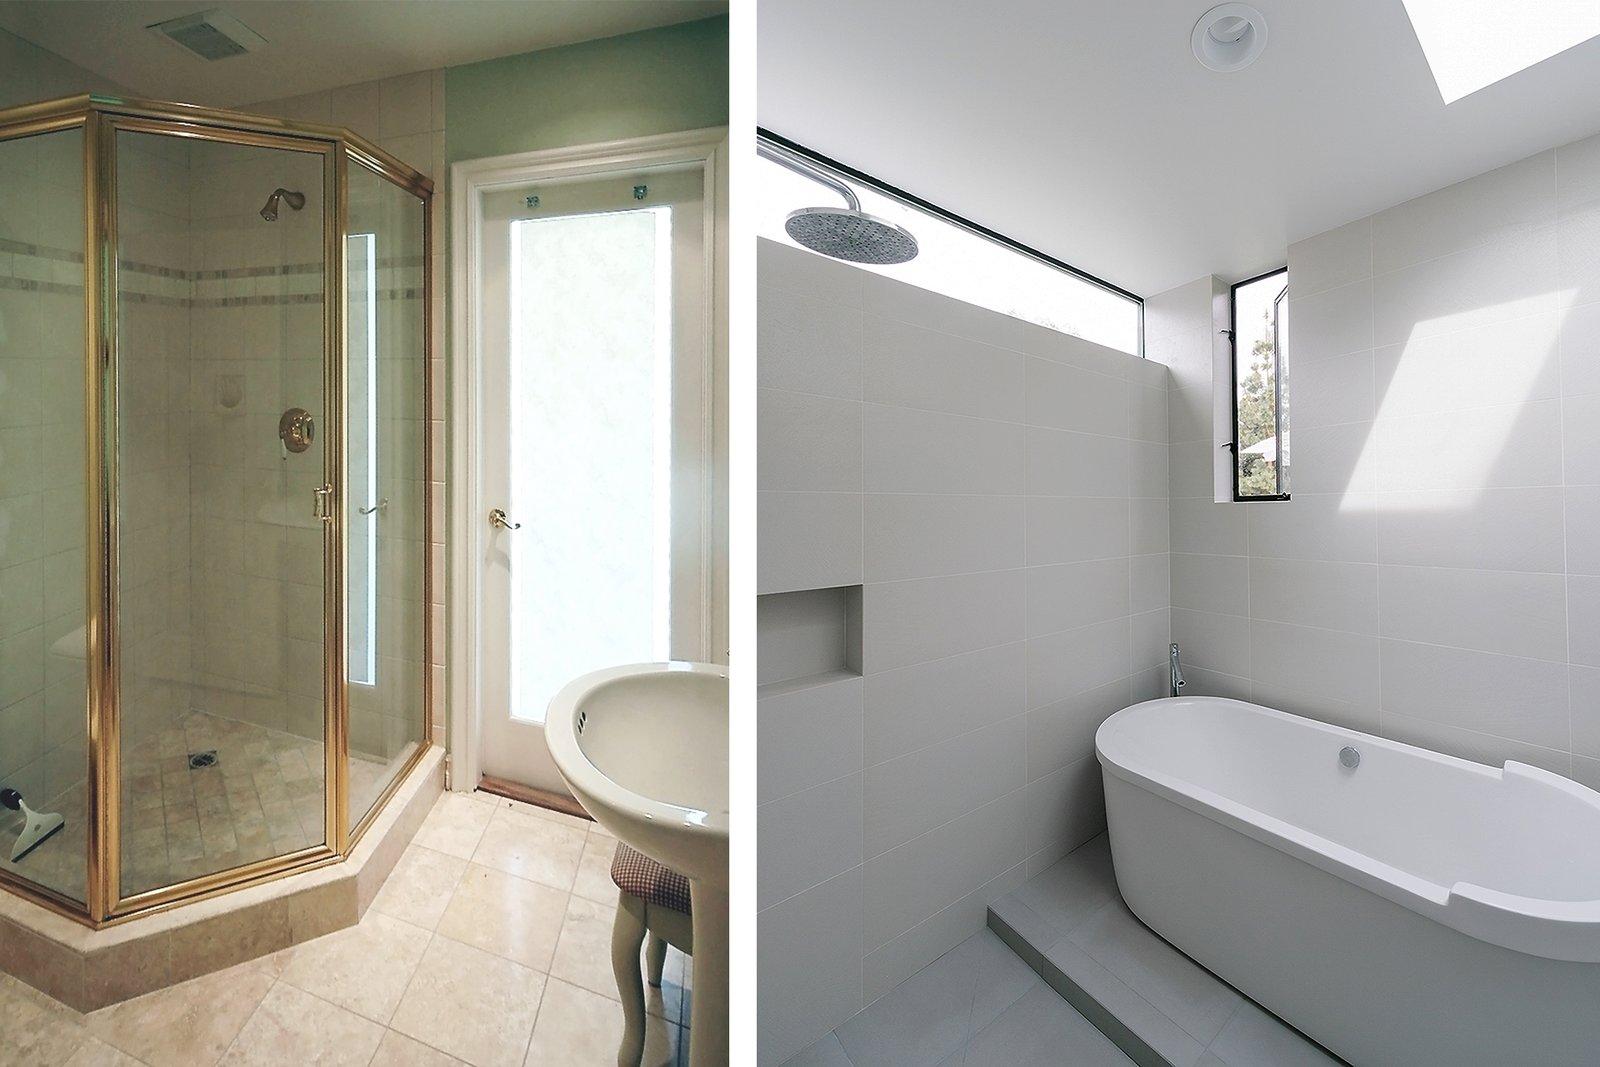 Bath Room BEFORE / AFTER  [master bathroom, villa park modern]  Villa Park Modern by MYD studio, inc.